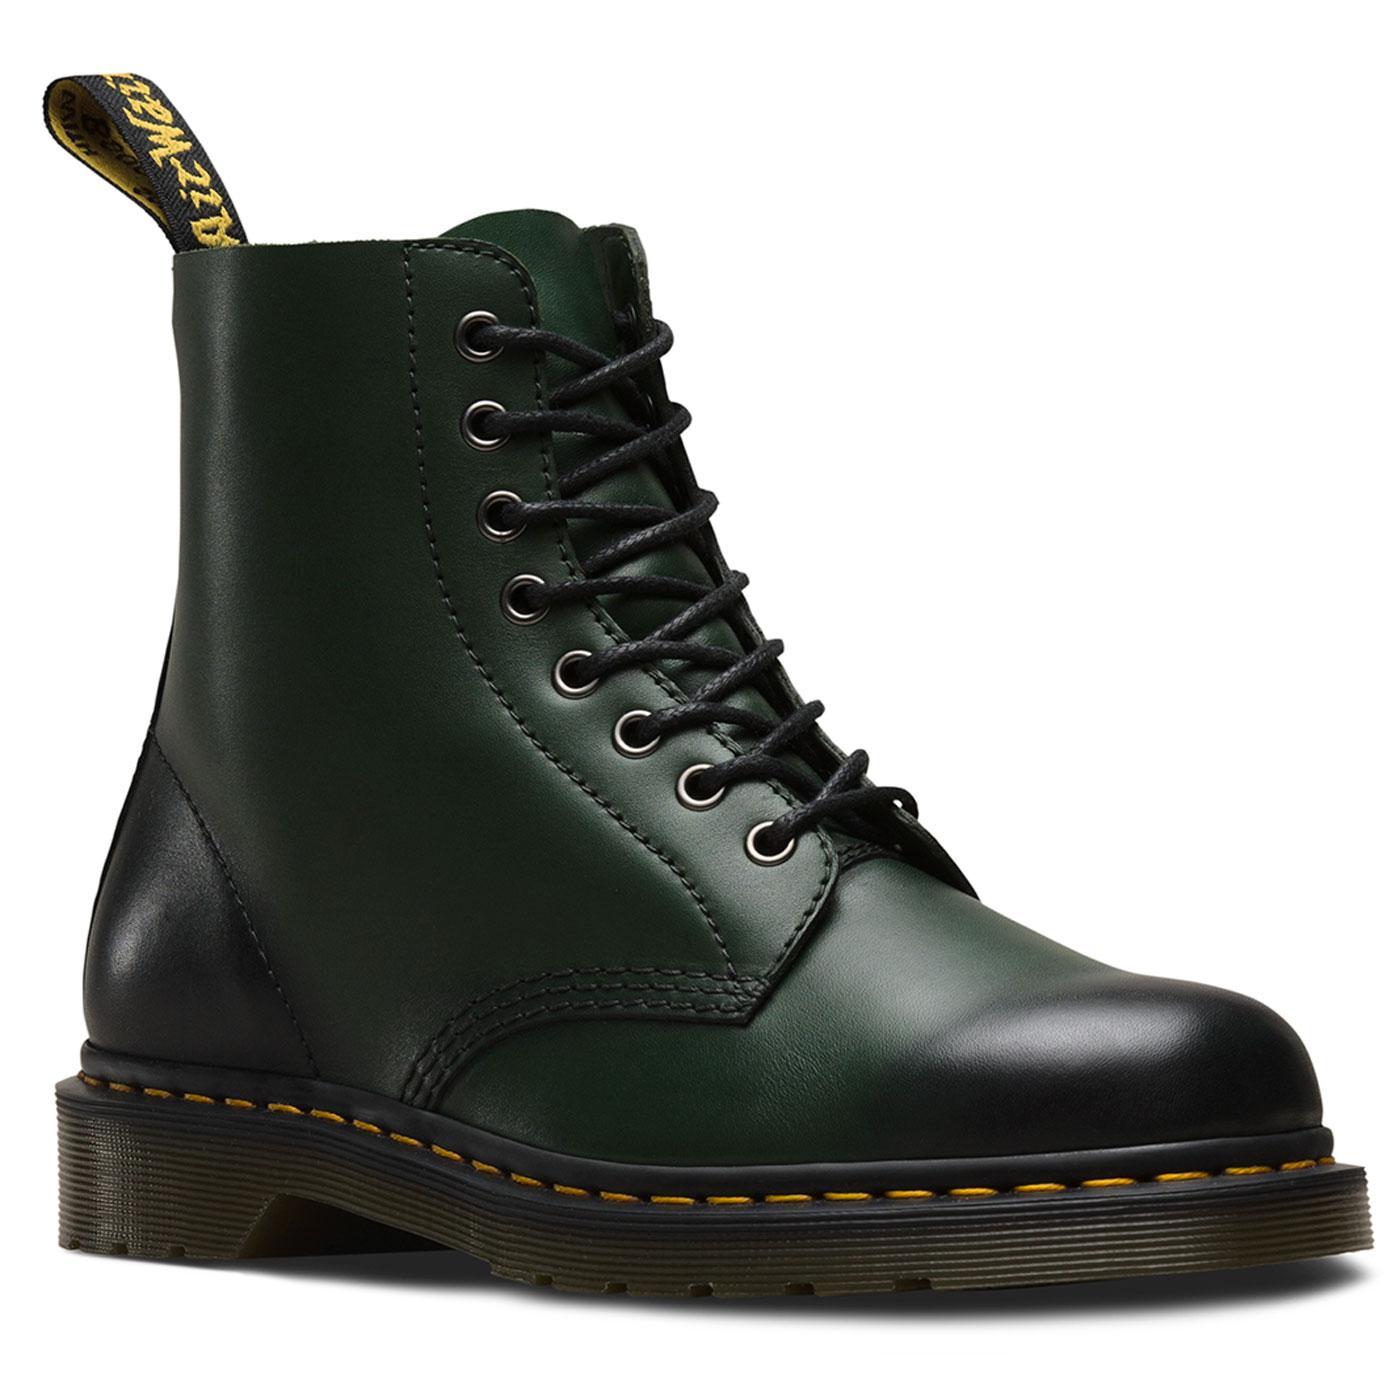 Pascal DR MARTENS Antique Temperley Boots Green